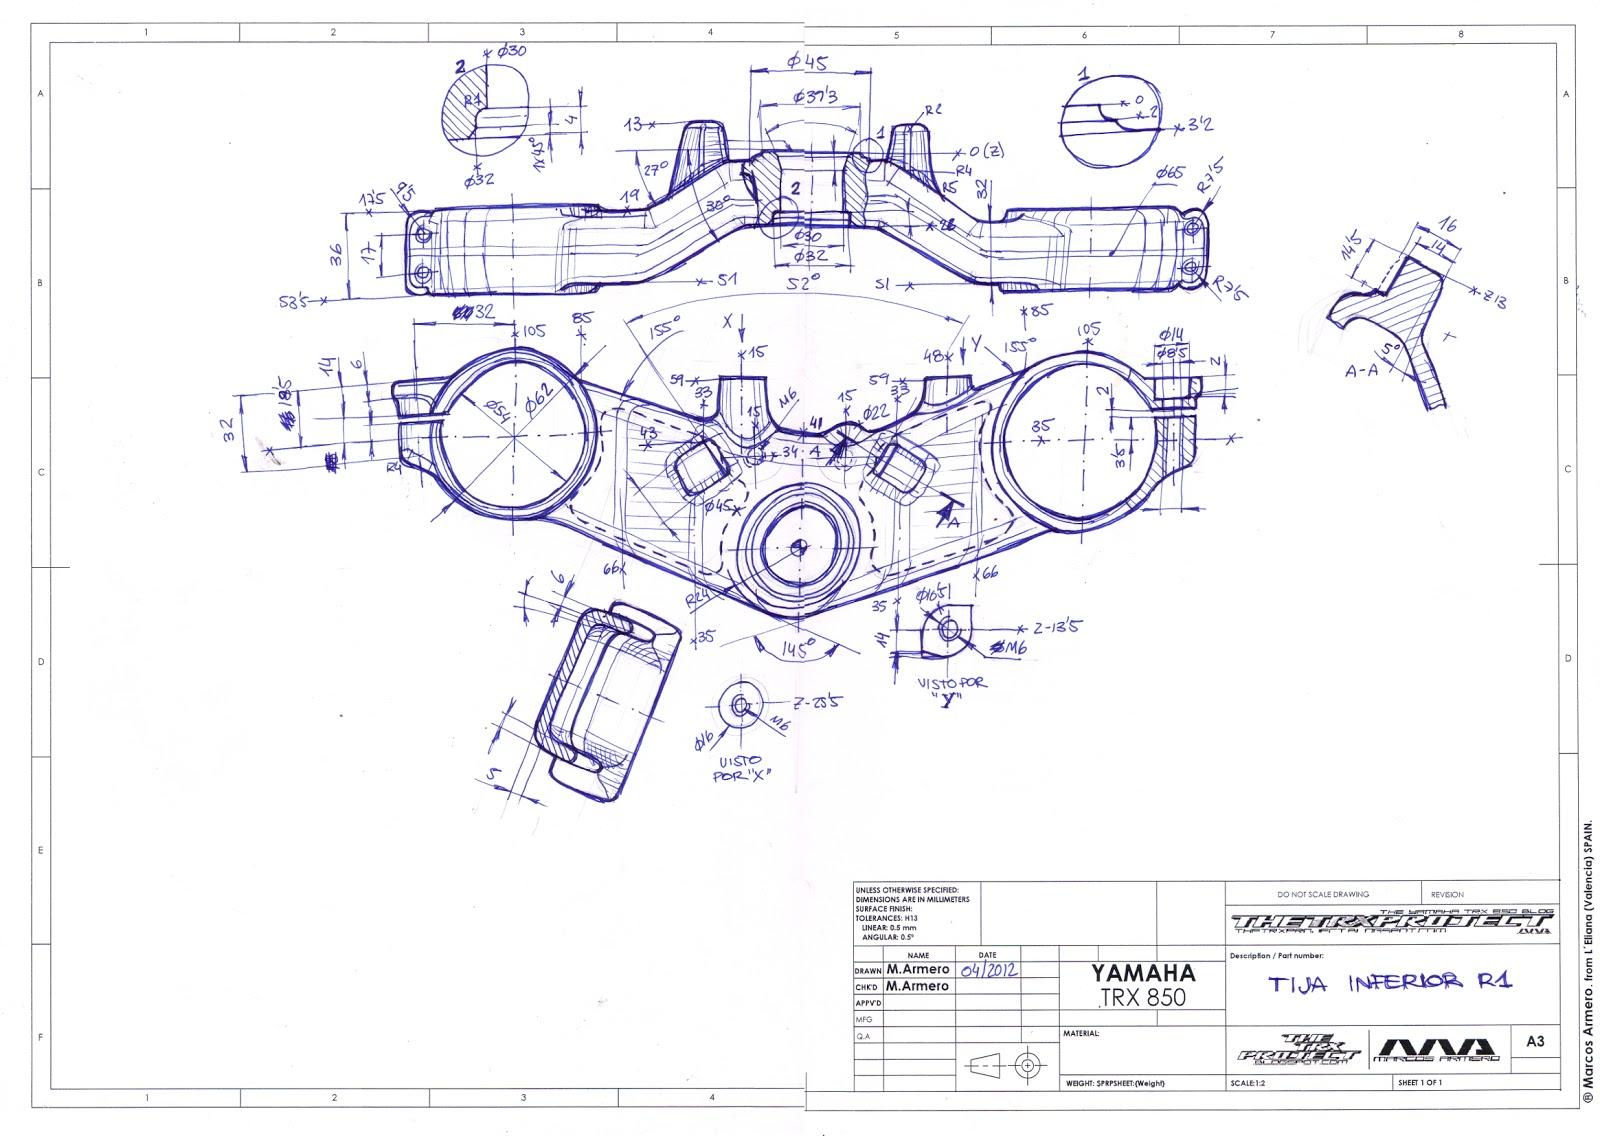 The TRX Project The Yamaha TRX 850 blog: 3D Yamaha R1 (RN04) Lower Yoke